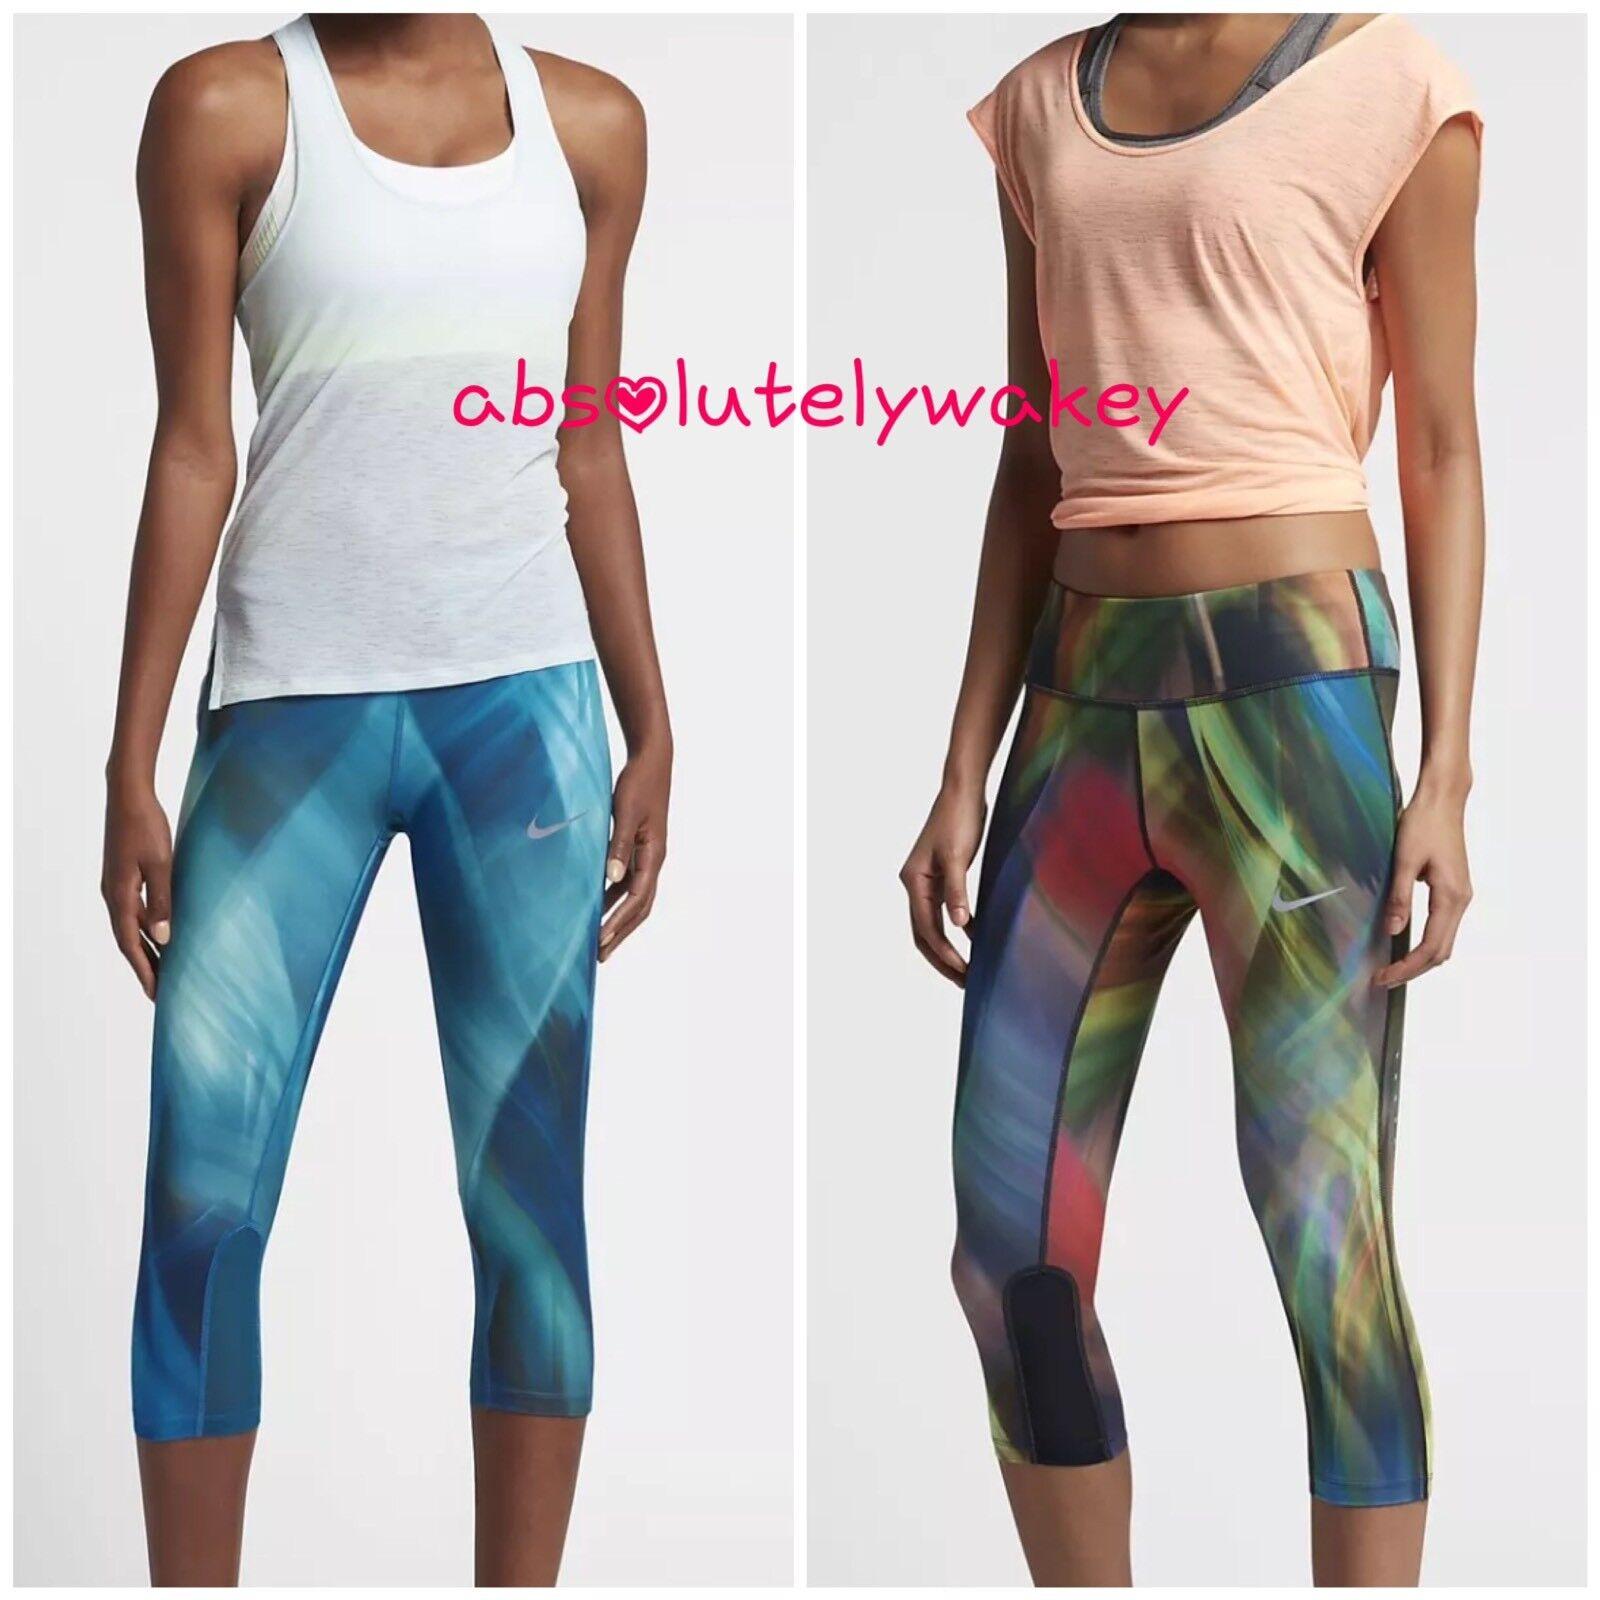 NIKE POWER EPIC Women's Running Training Gym Capris Dri-FIT Compressive Fit